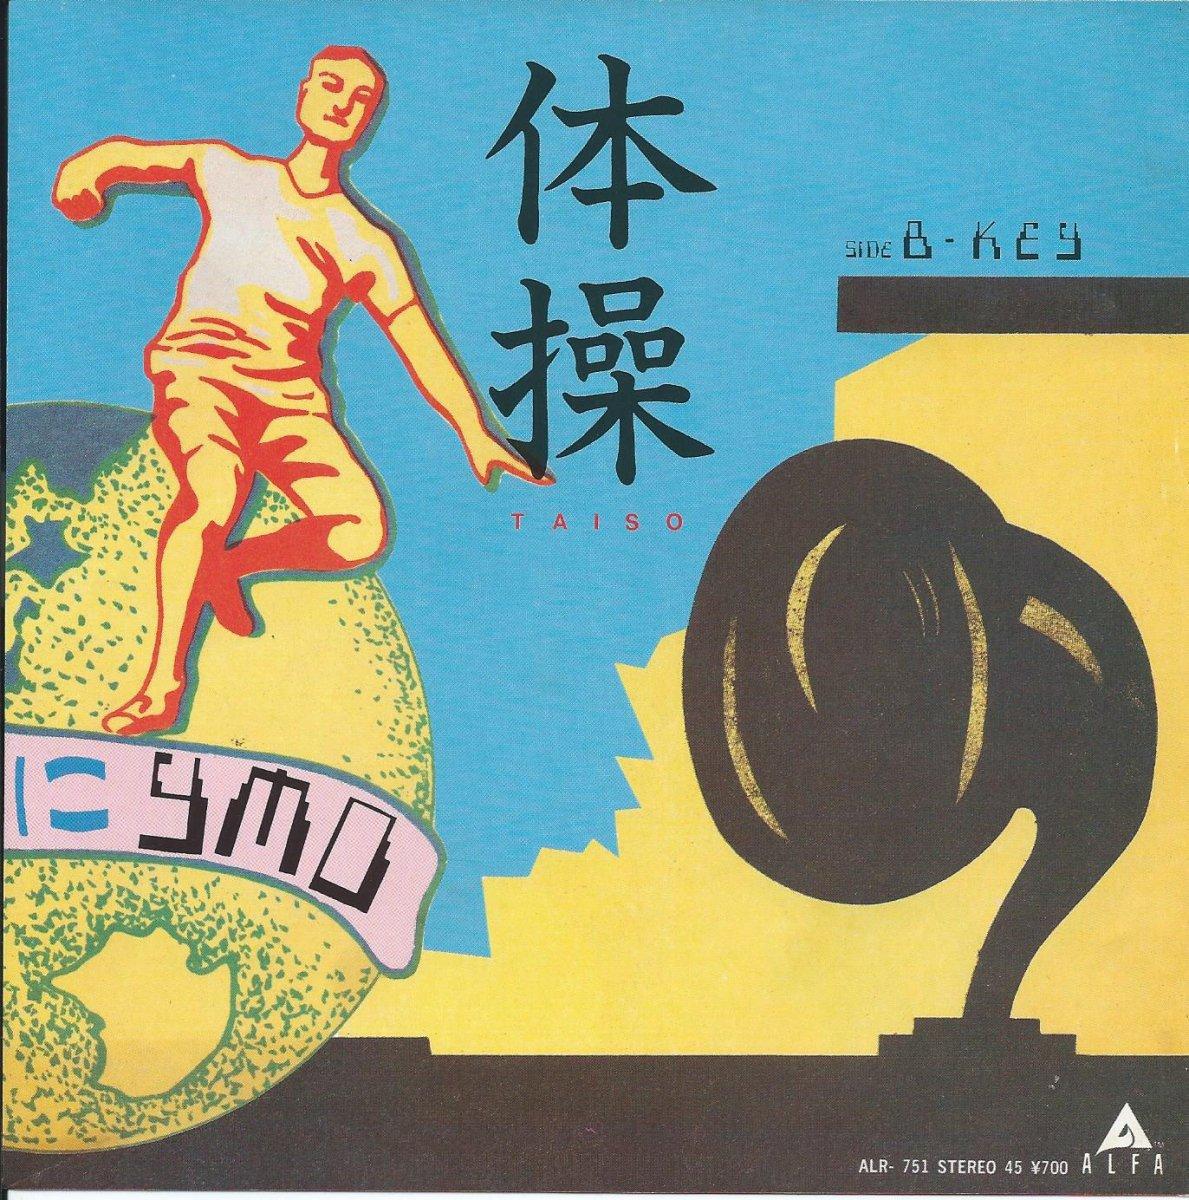 Y.M.O. (YELLOW MAGIC ORCHESTRA) / 体操 TAISO / KEY (7